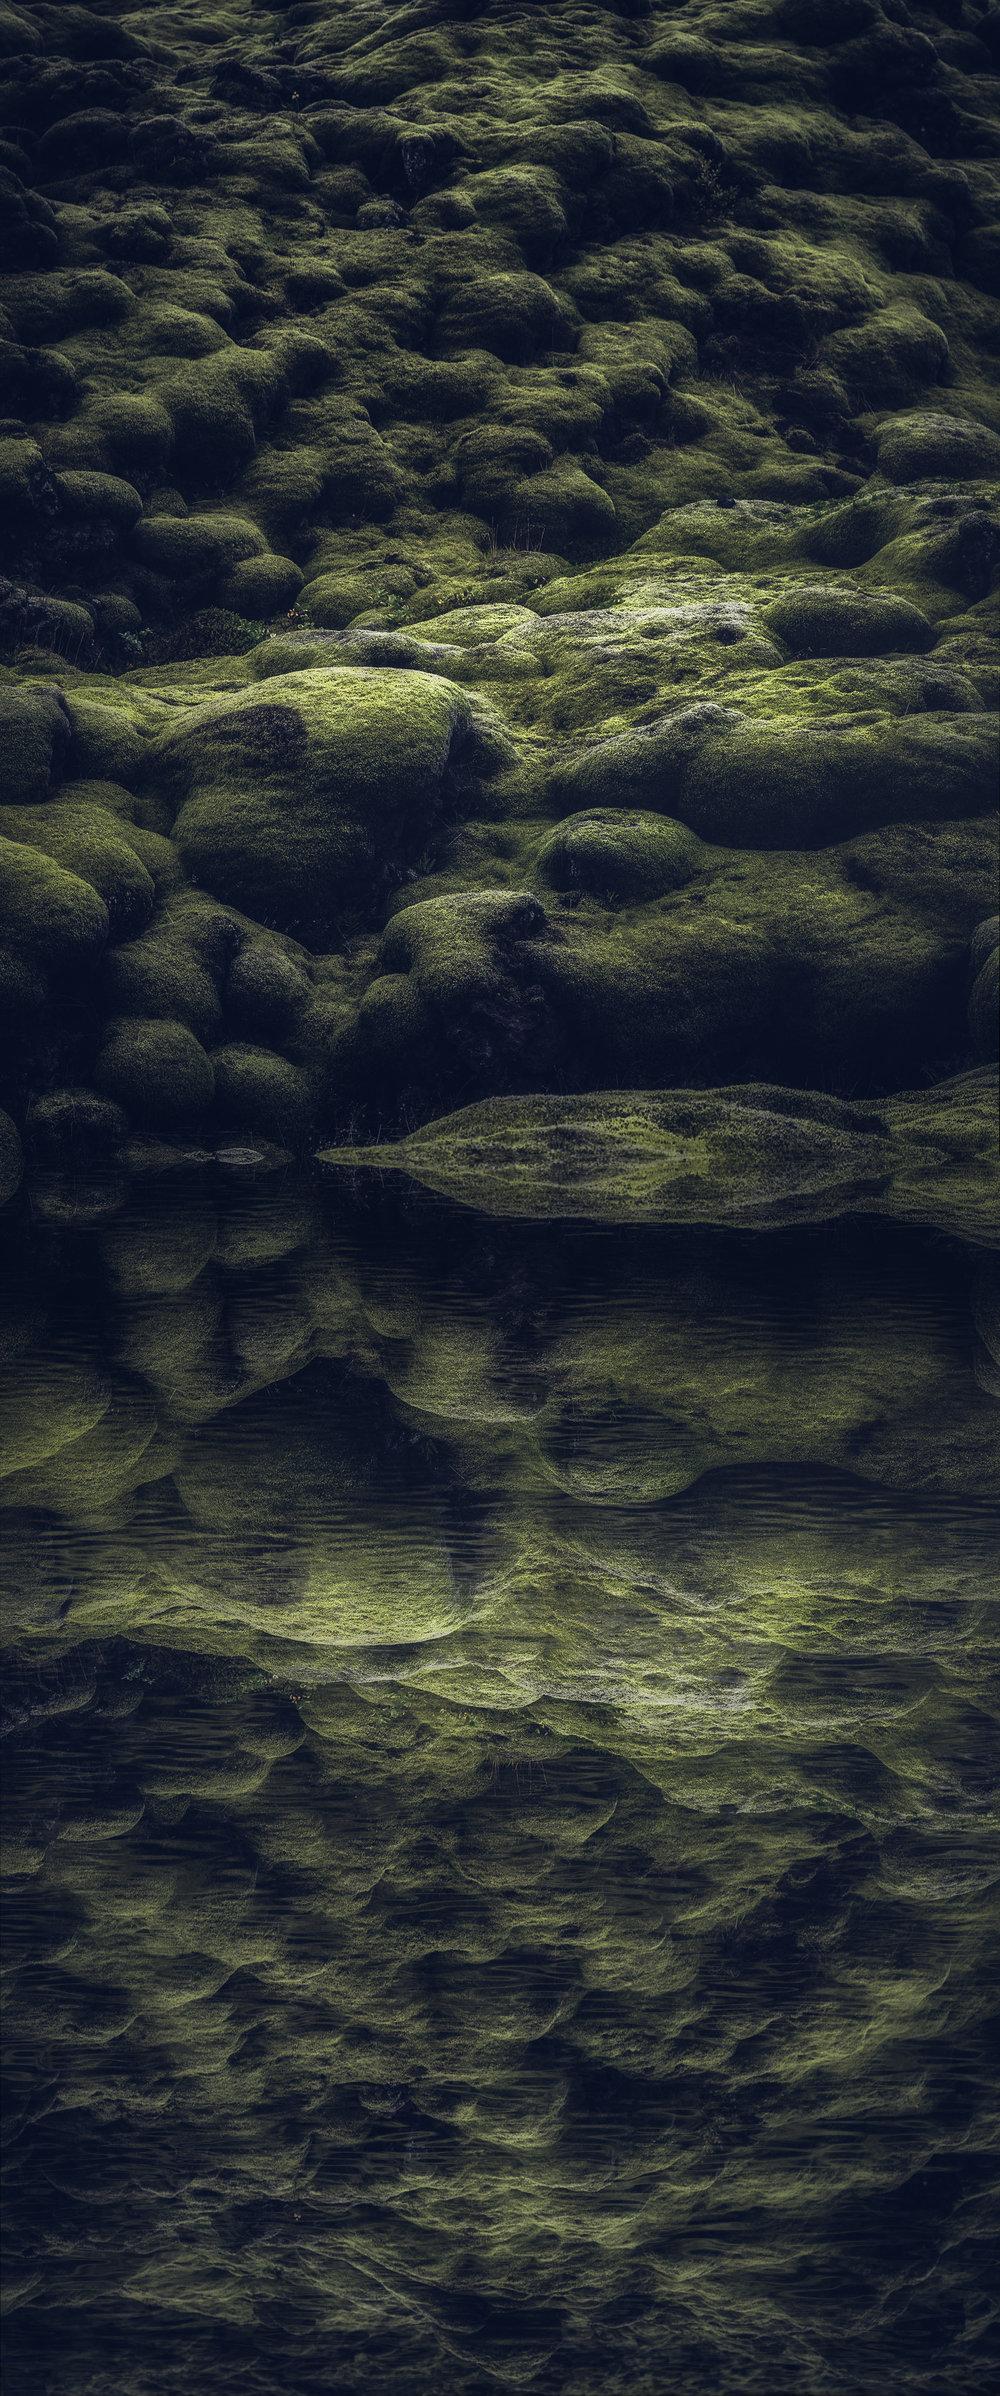 Volcanic rock reflection April 2018 flickr_.jpg